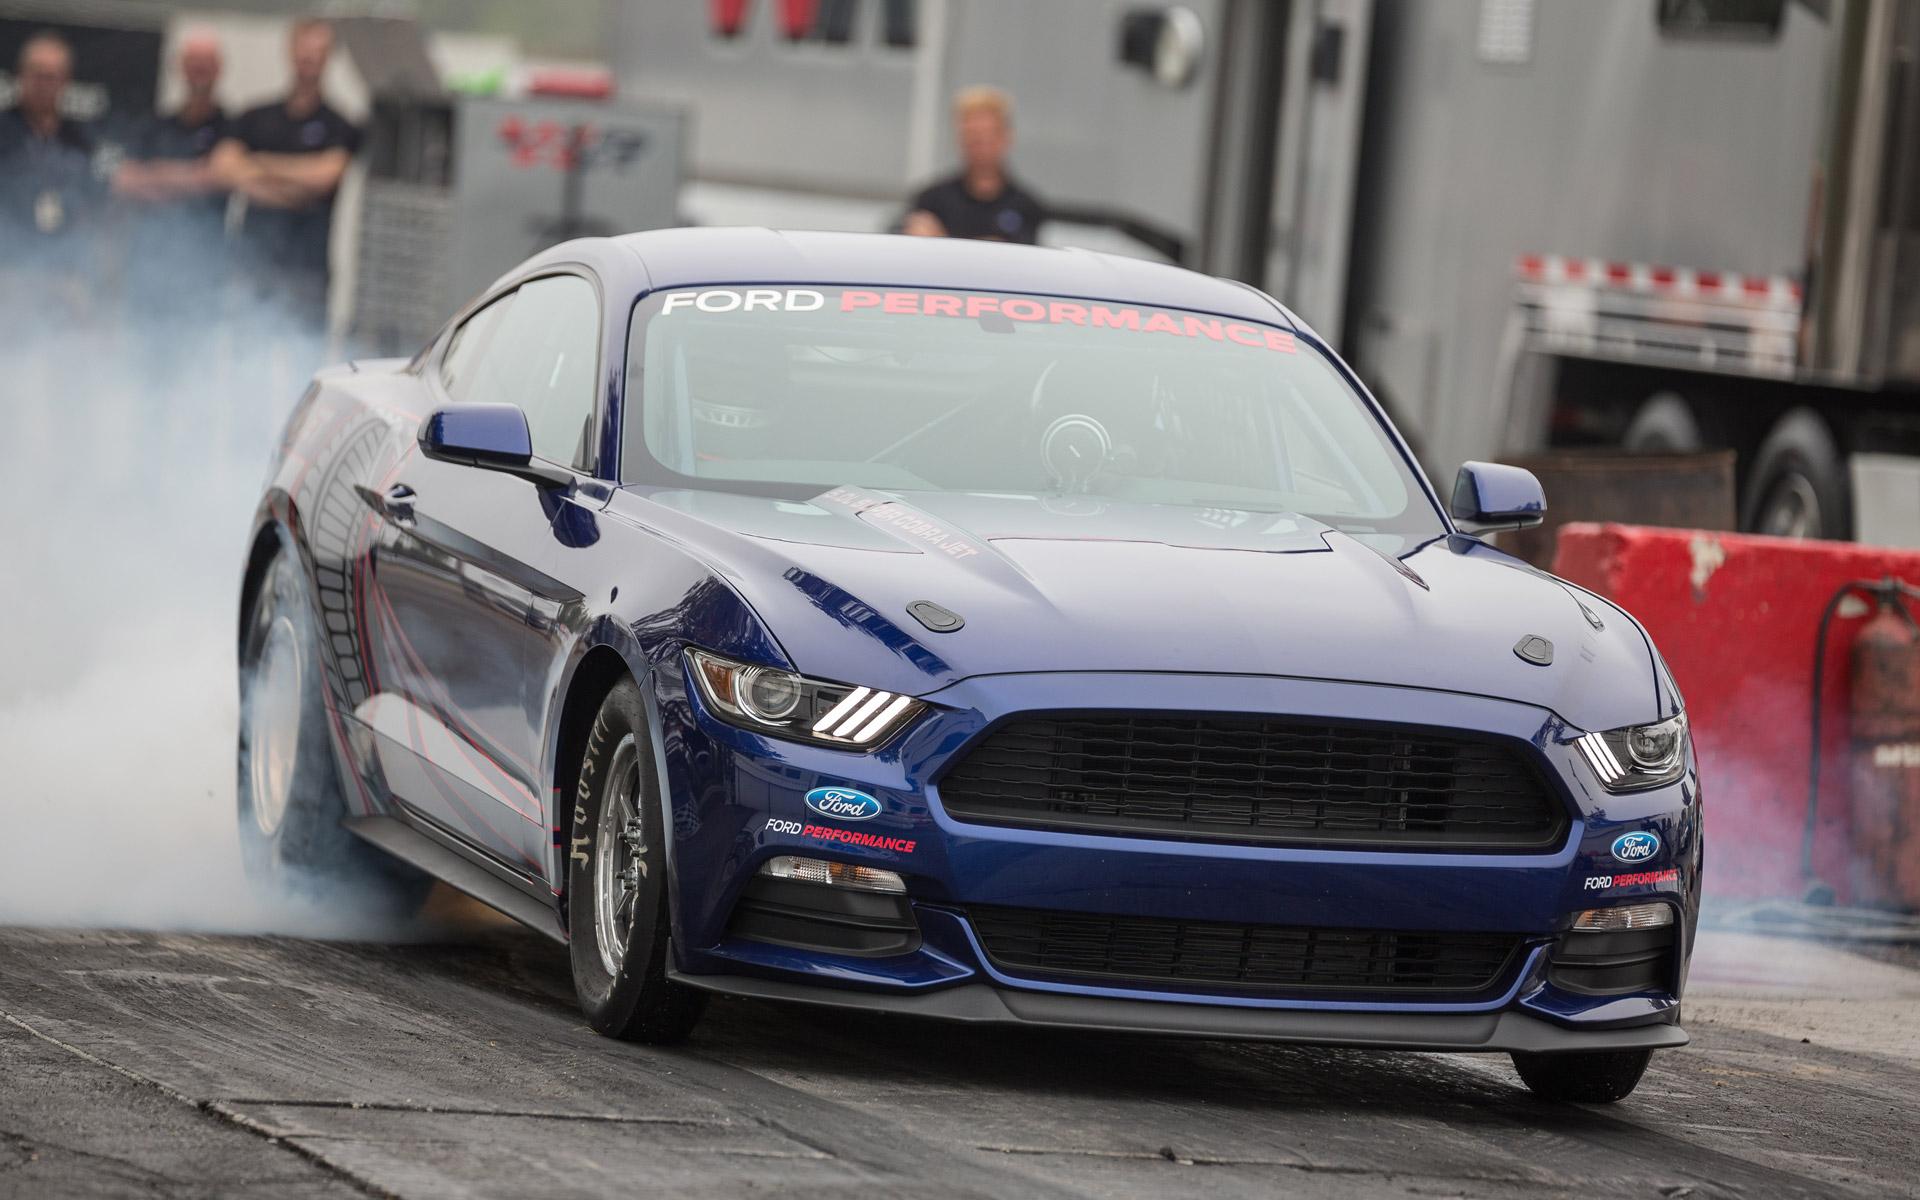 2016 Ford Mustang Cobra Jet Revealed, Runs 8.0-Second Quarter Mile: Video